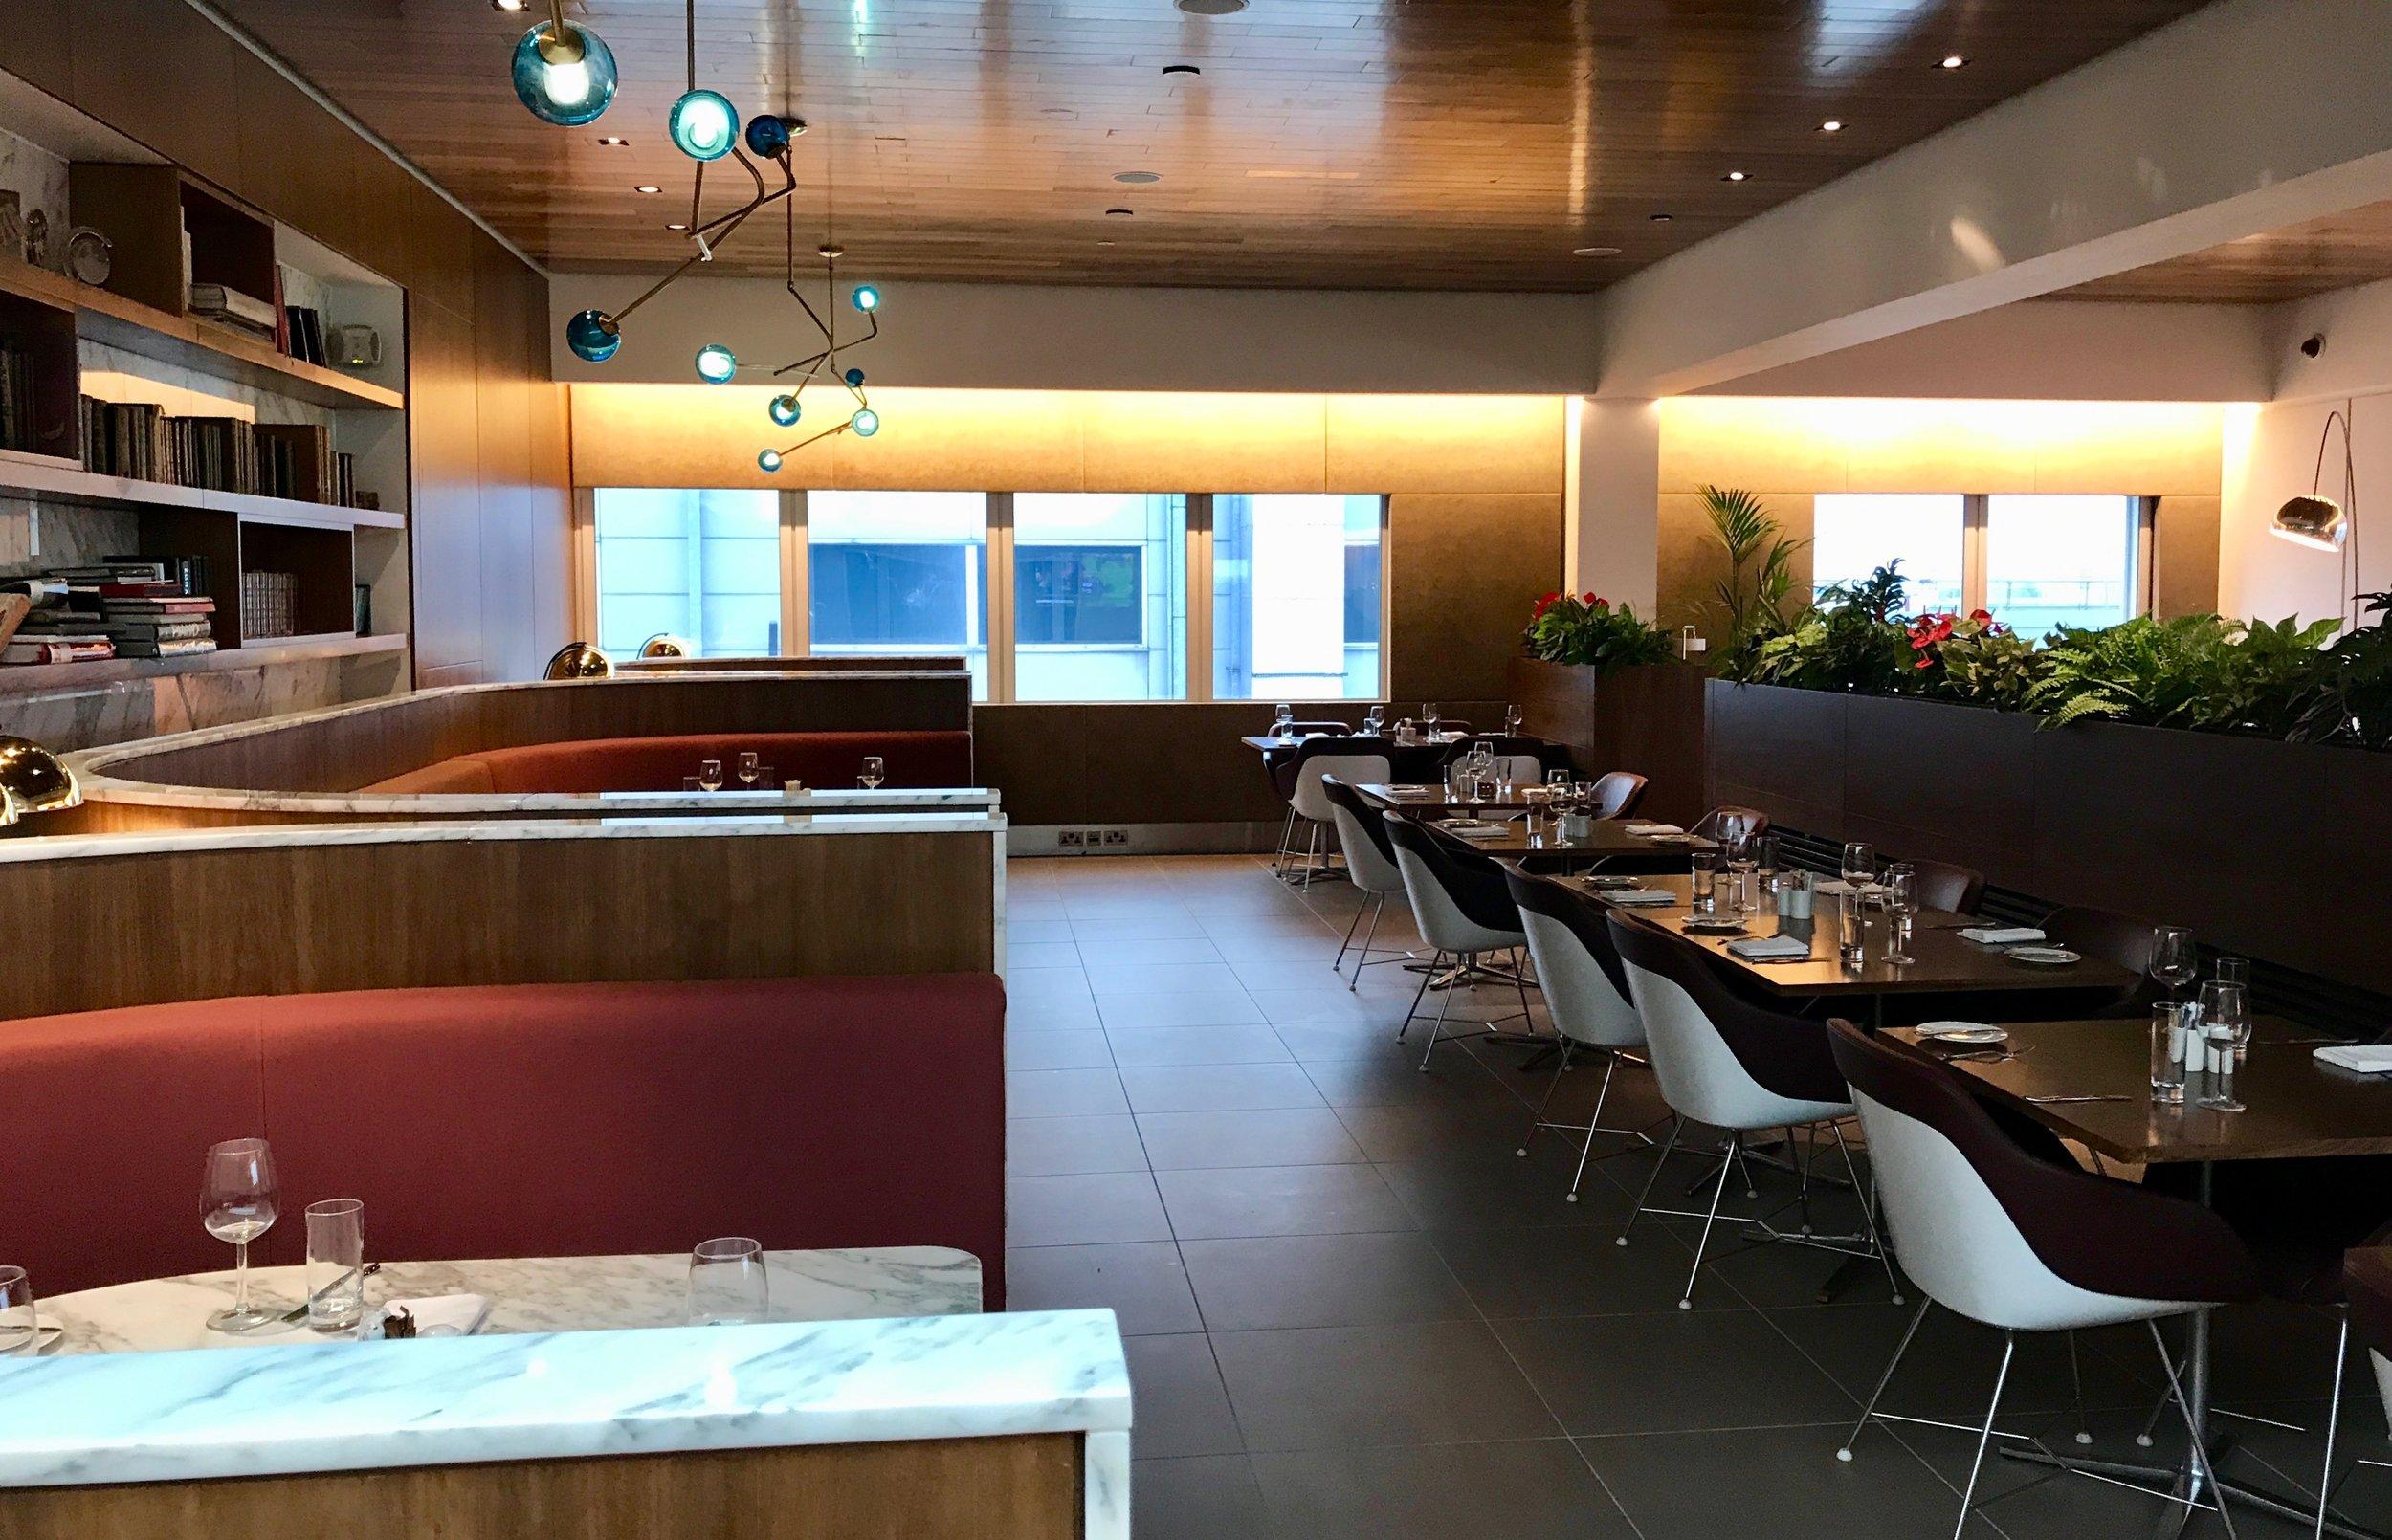 Virgin Atlantic Clubhouse Lounge London Heathrow LHR Airport - 24.jpg